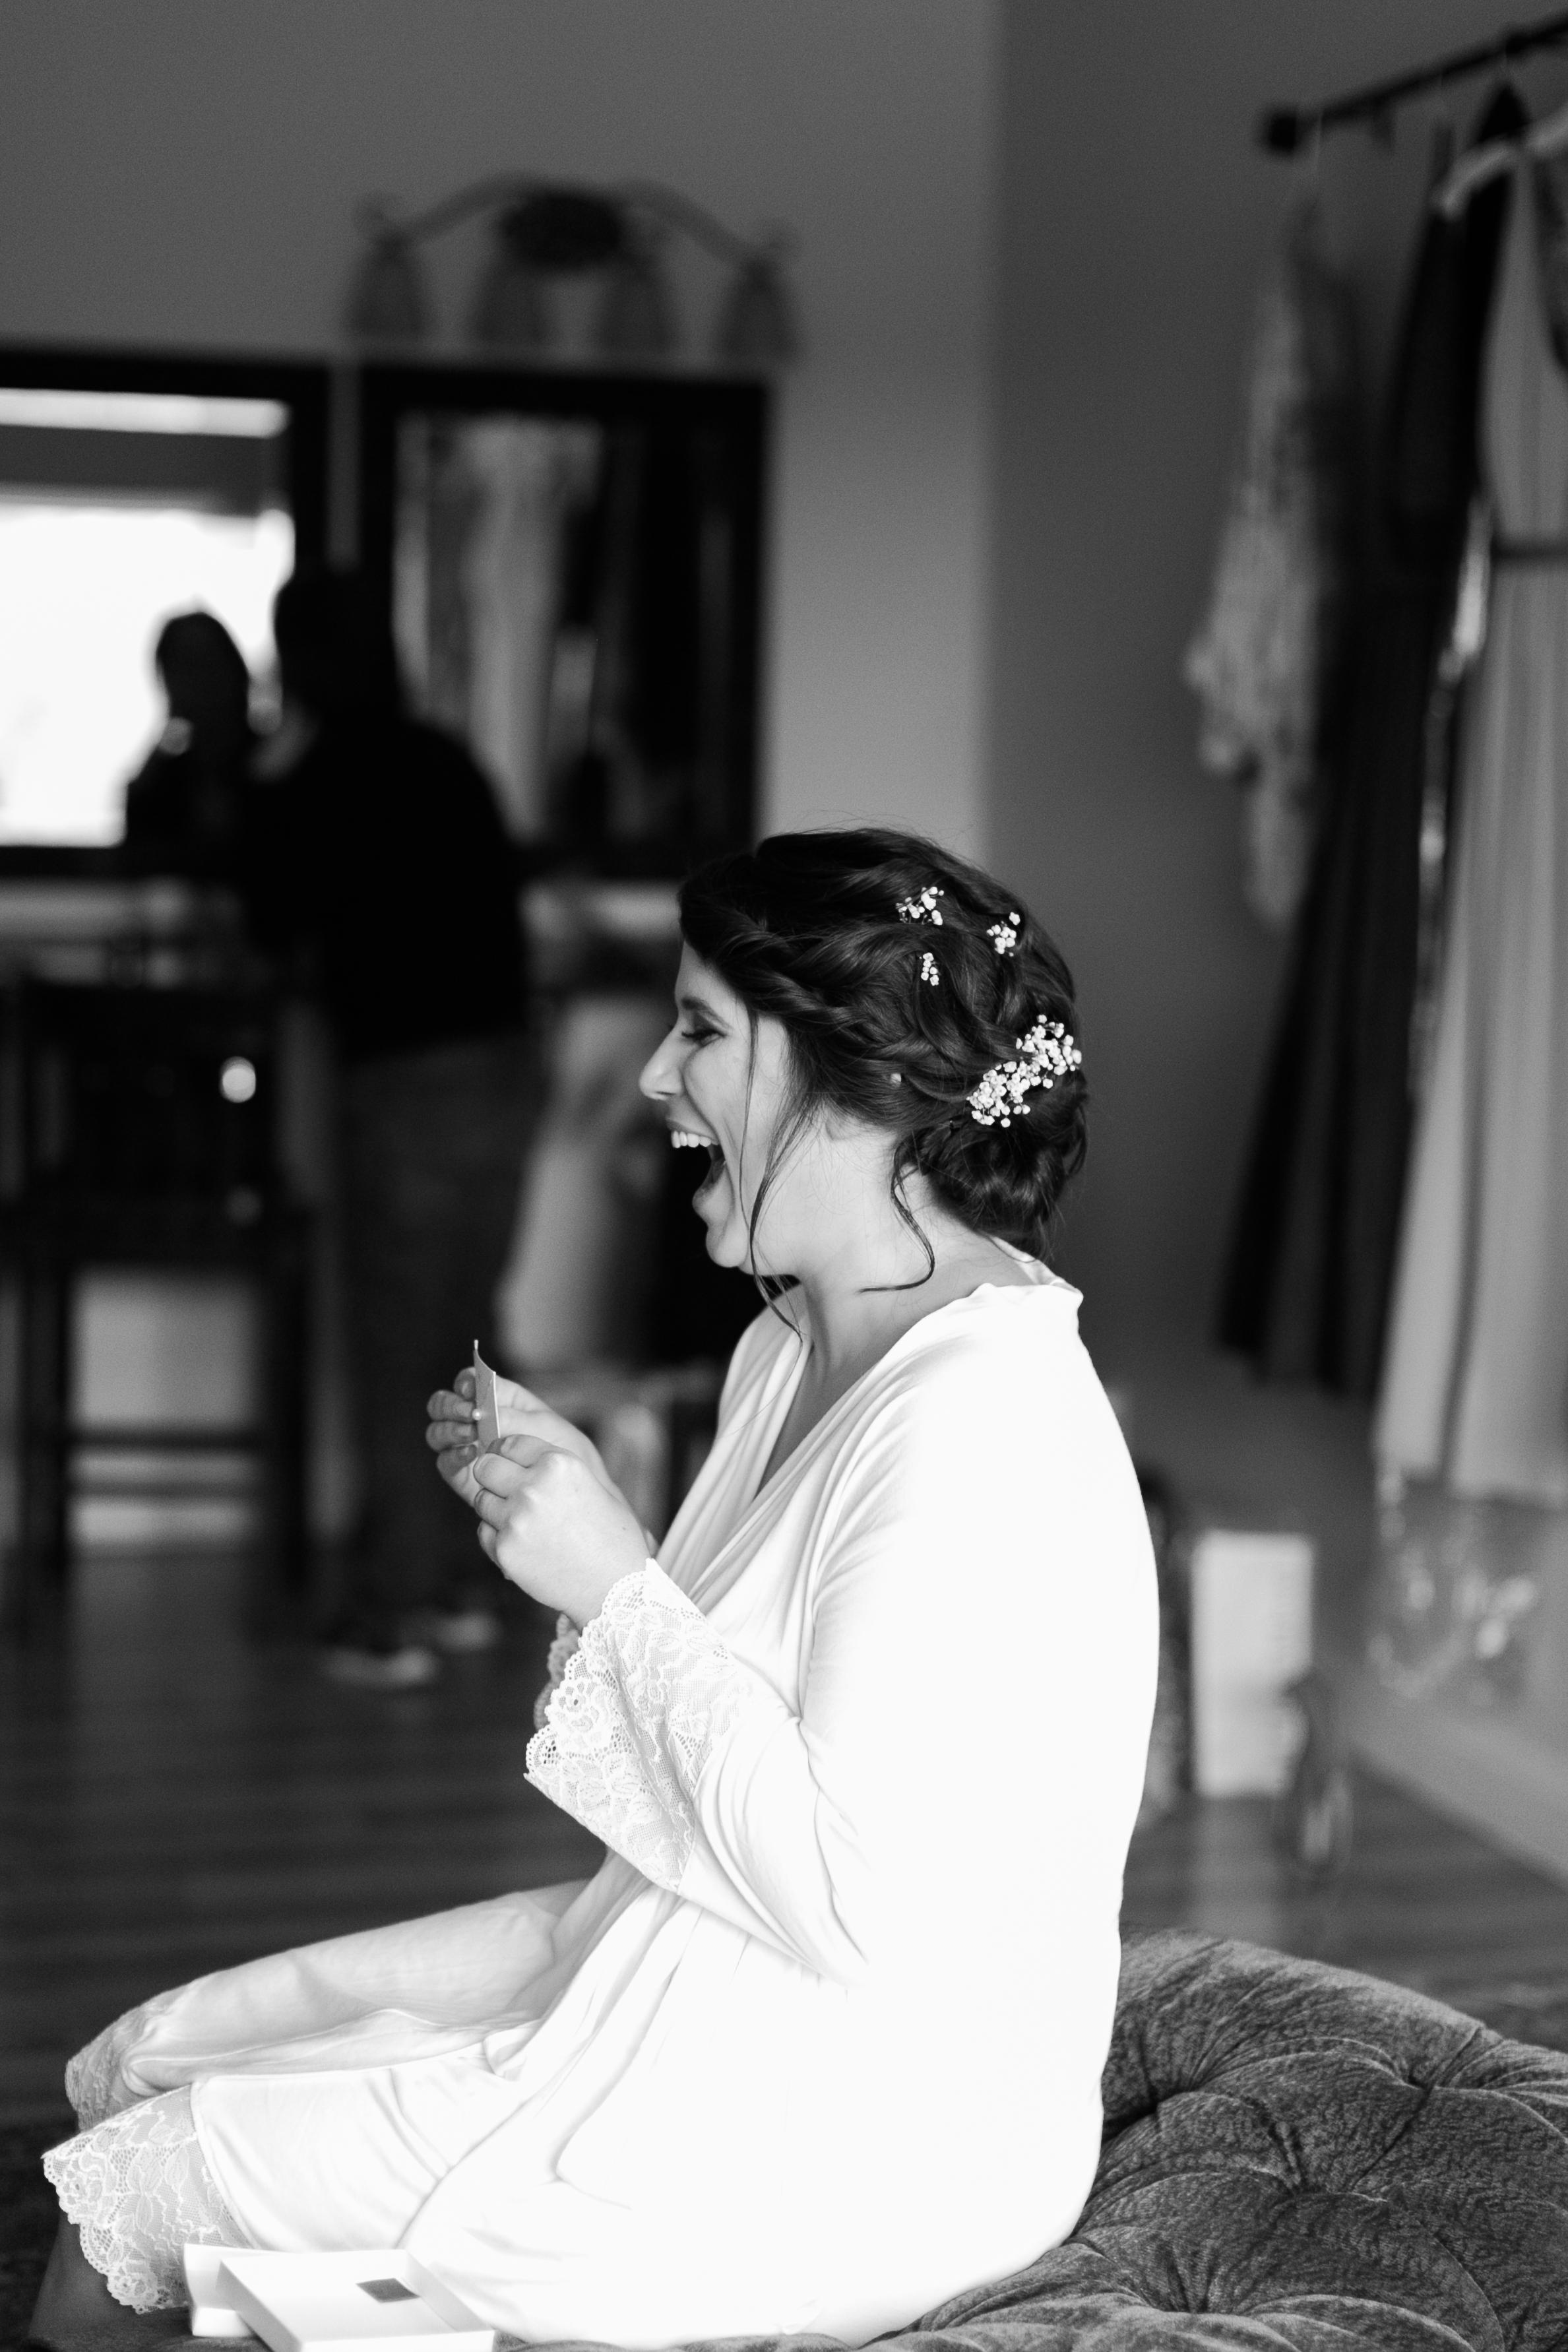 Austin_Texas_Fine_Art_Wedding_Photographer_Kayla_Snell_Photography_Antebellum_Oaks60.jpg